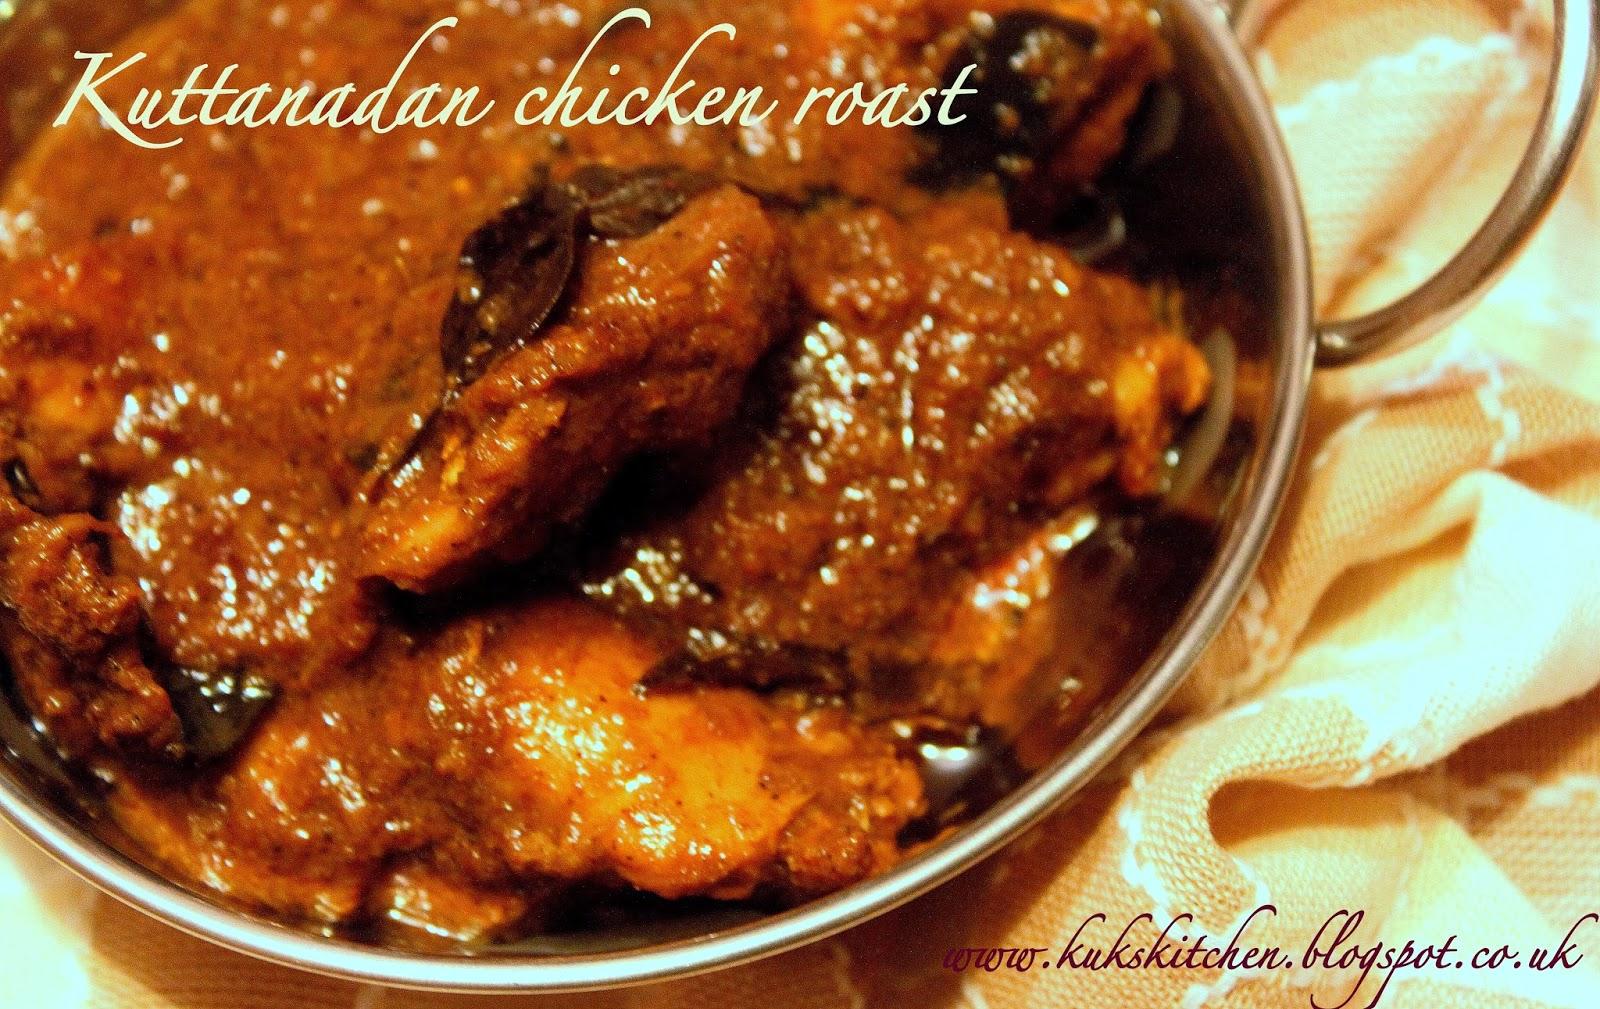 Kuks kitchen easy kerala malayali syrian christian recipes kuttanadan chicken roast forumfinder Image collections